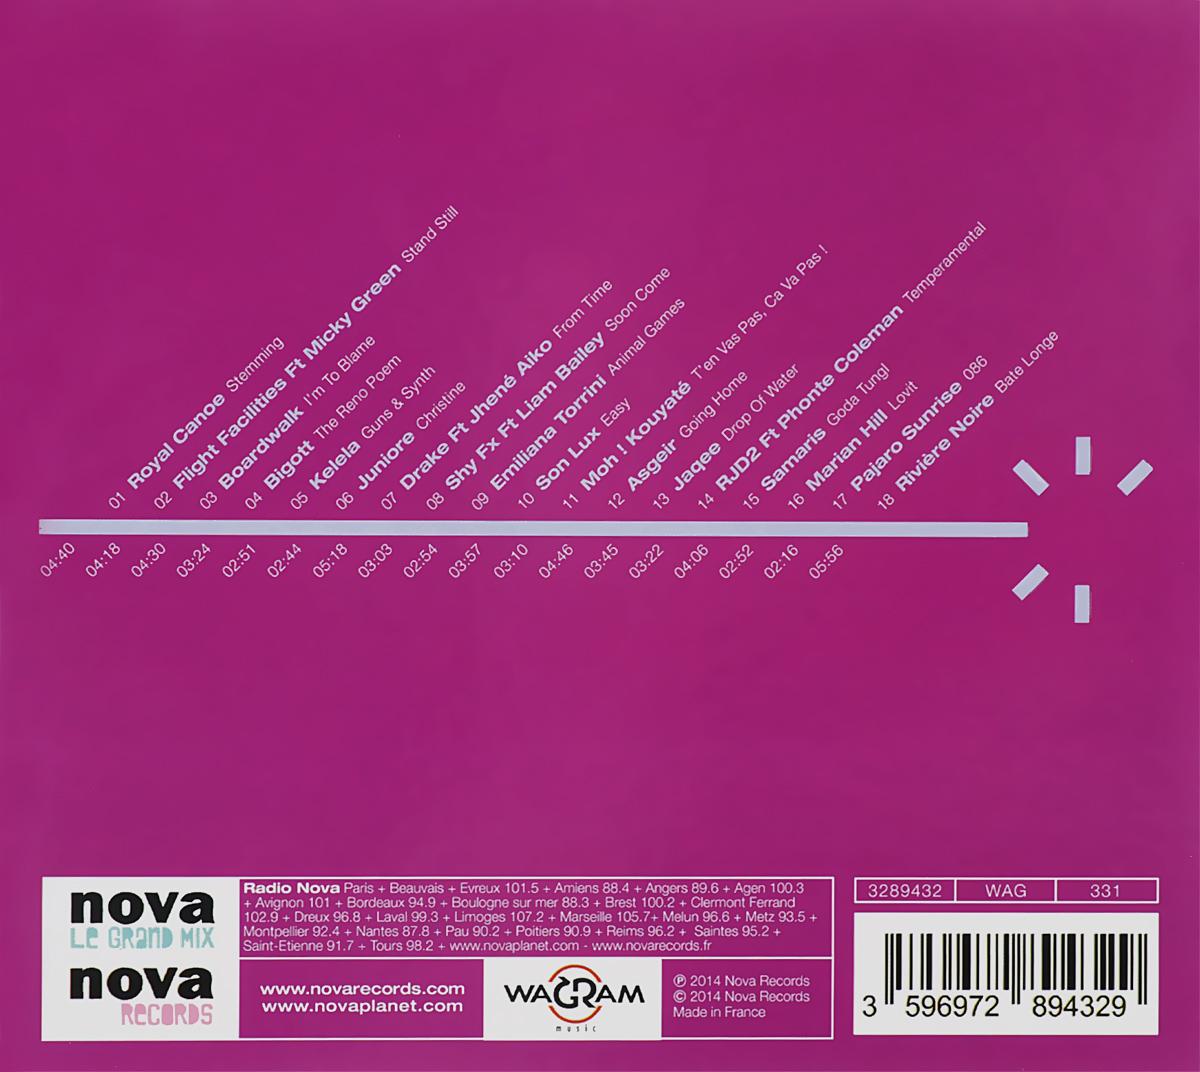 Nova Tunes 2. 9 Nova Records,Ракурс